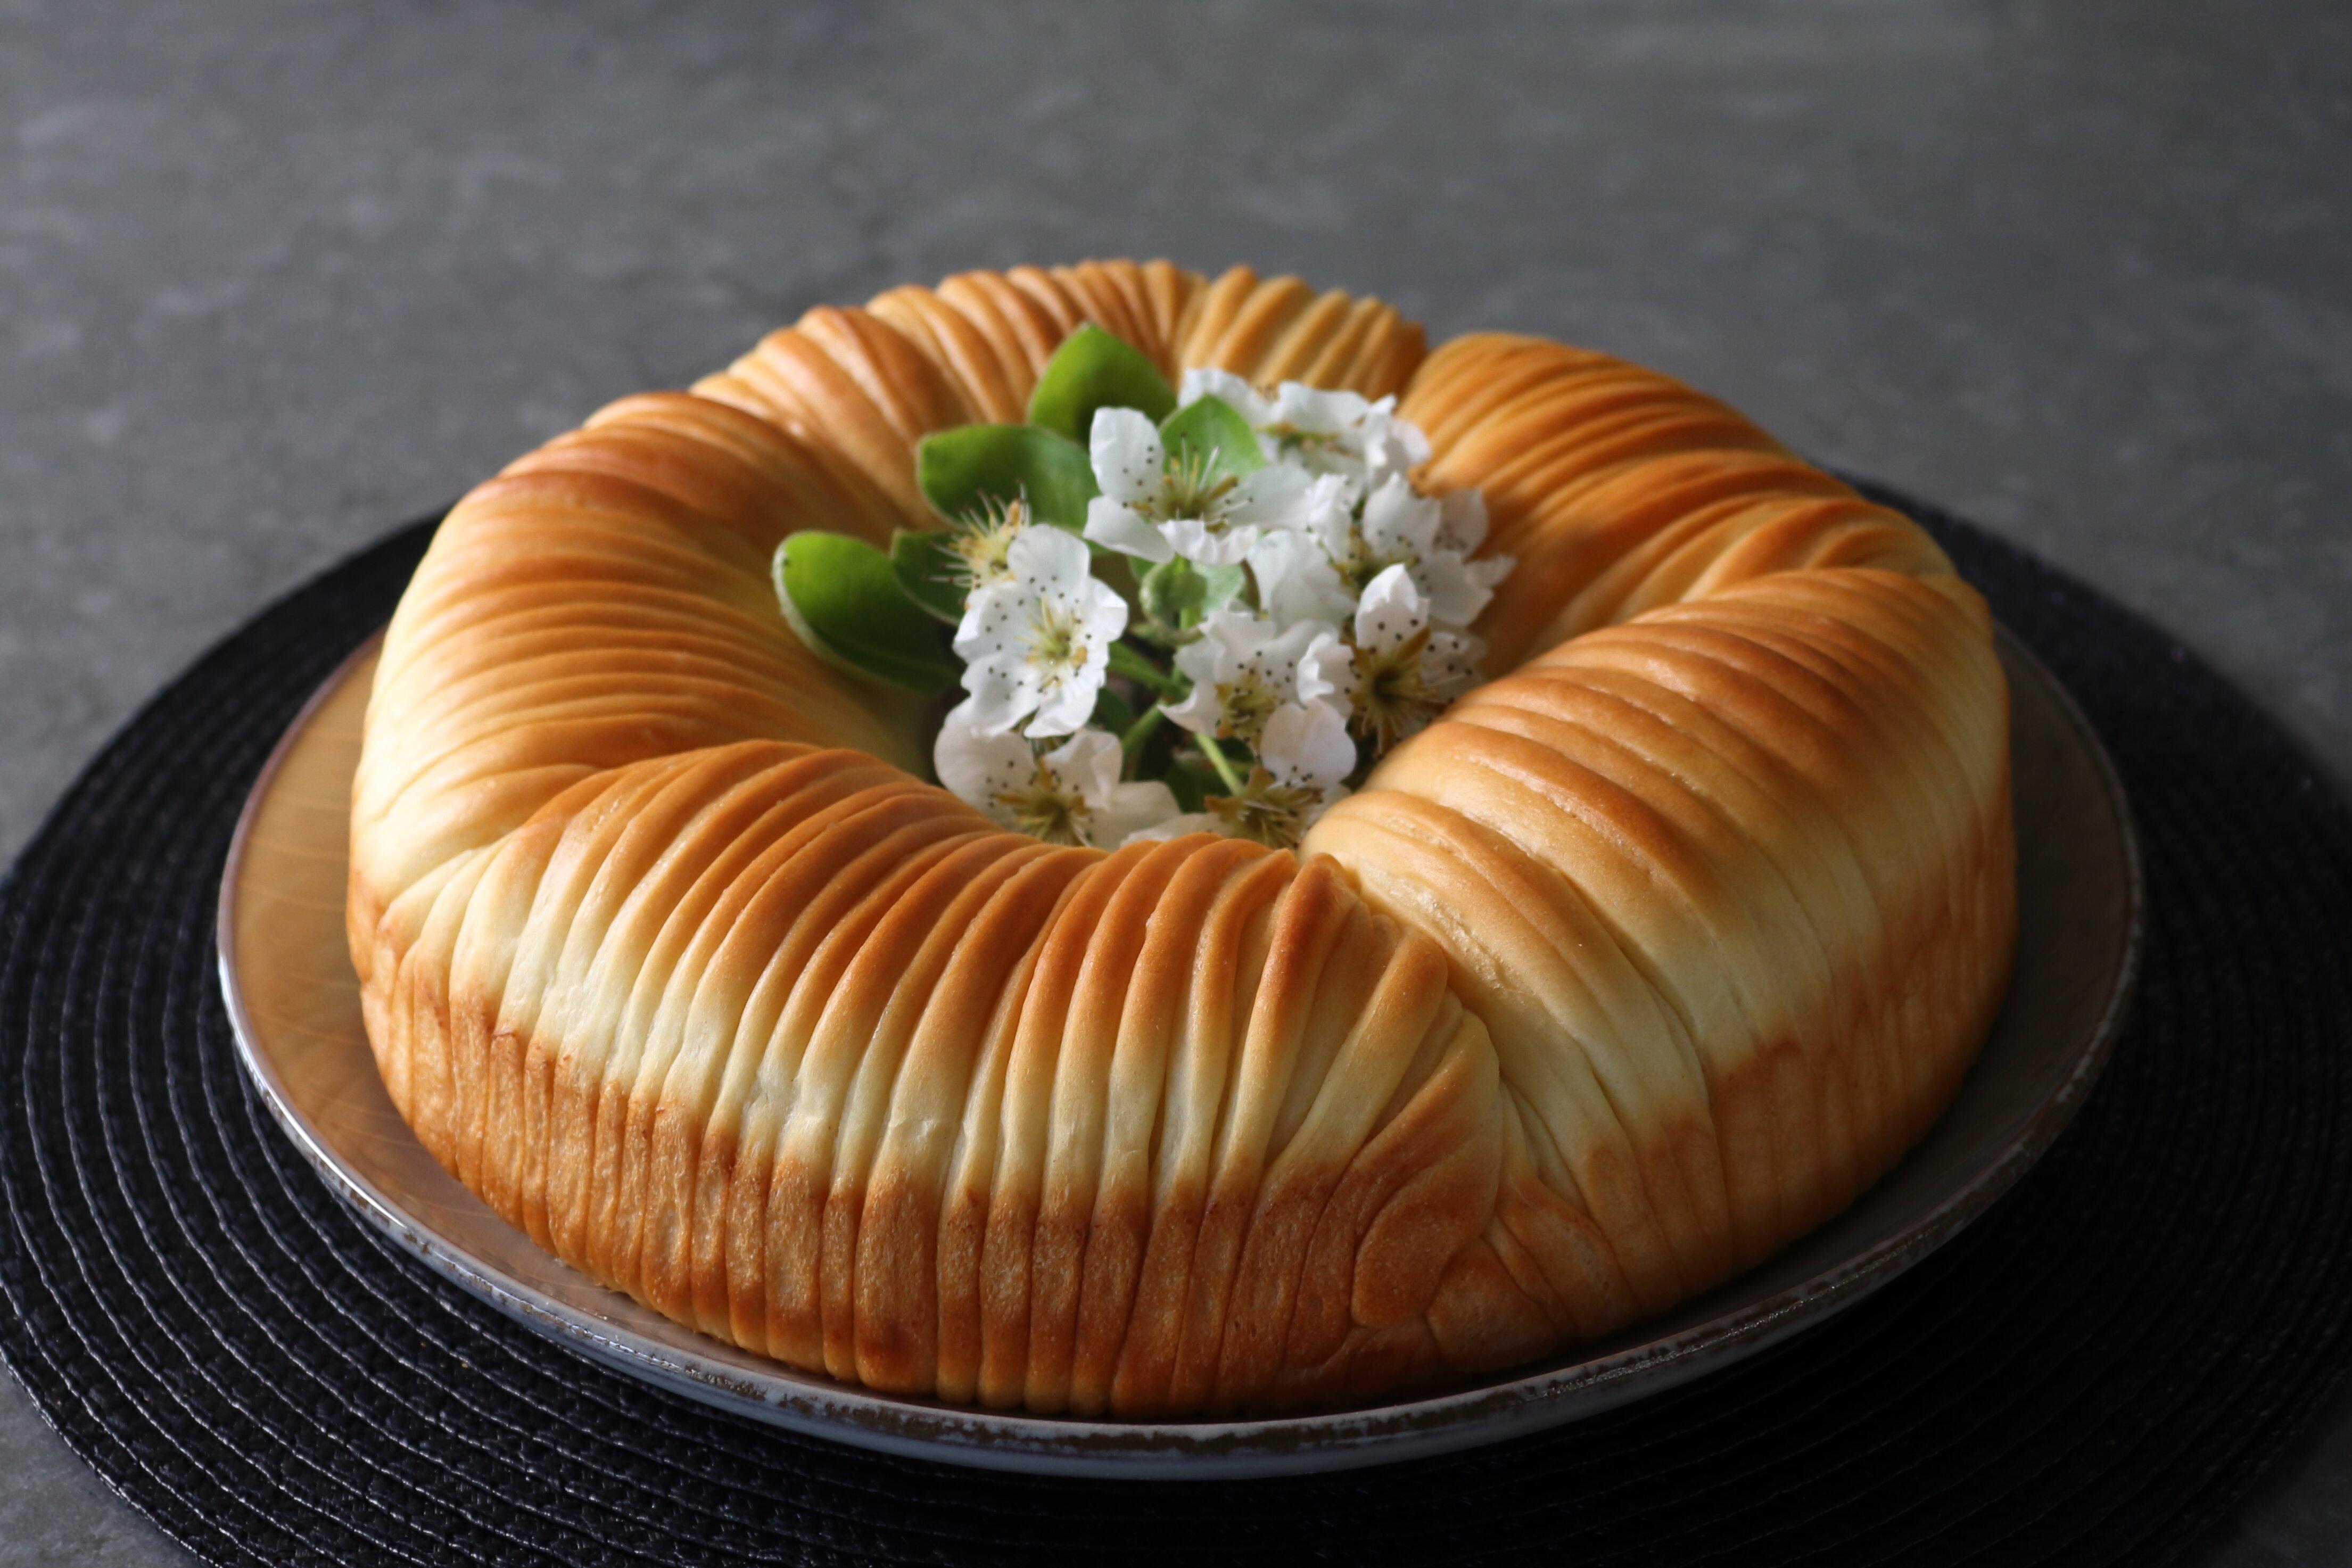 chef johns wool roll bread